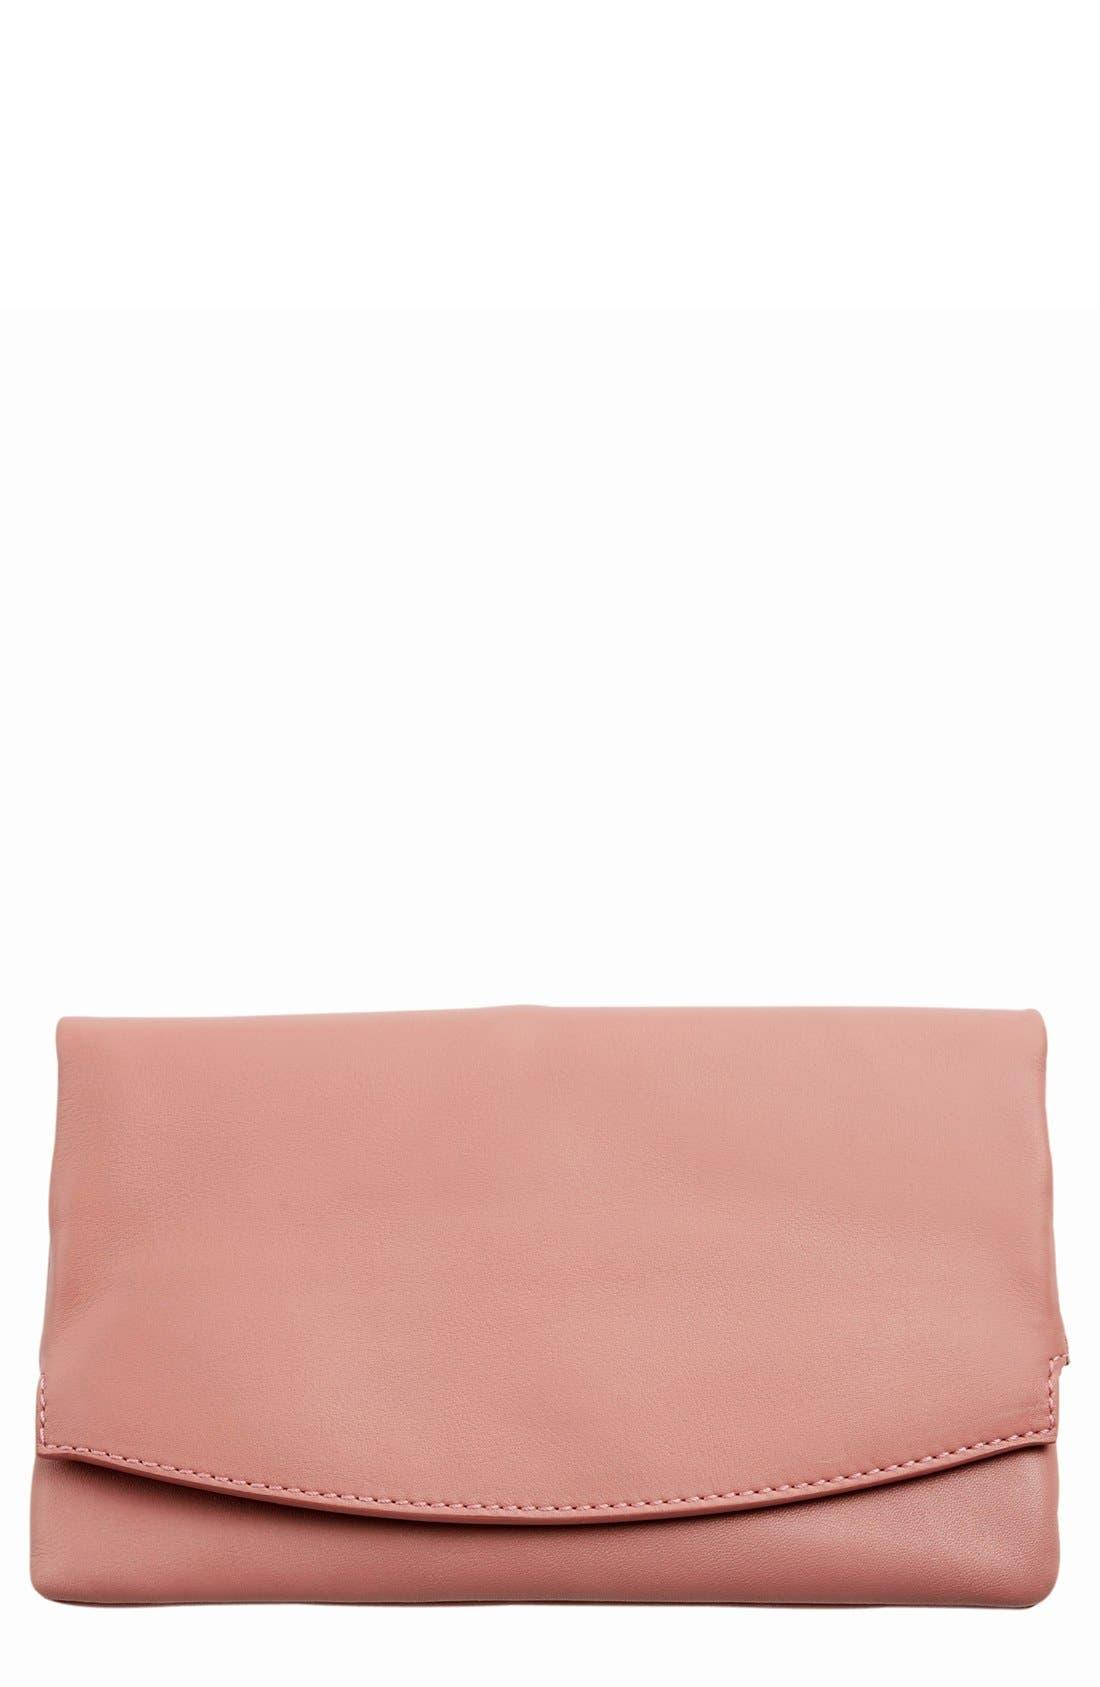 Main Image - Skagen 'Anne-Marie' Leather Flap Clutch